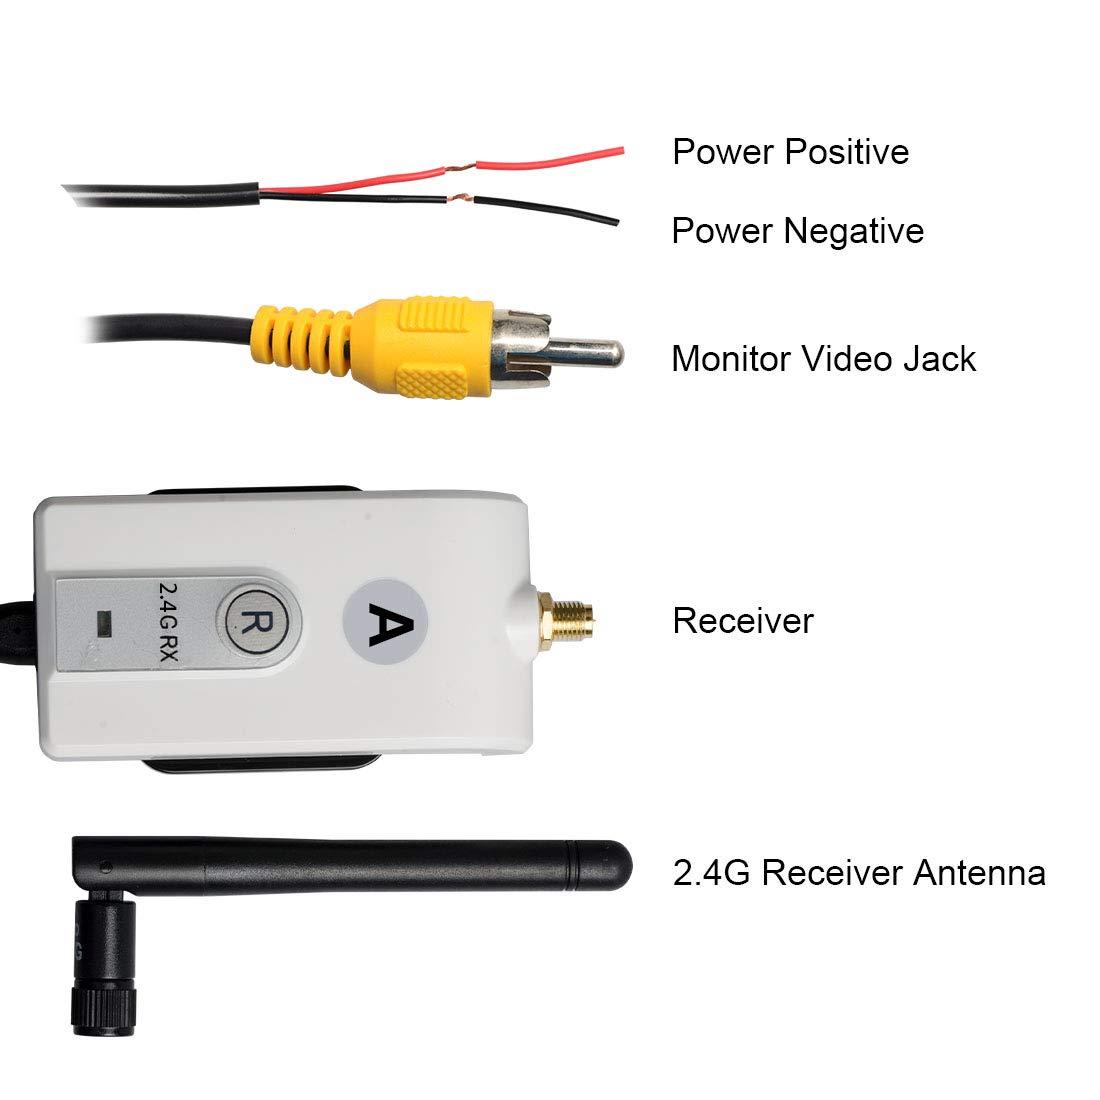 Kit de transmisor y Receptor de v/ídeo inal/ámbrico 12 V Sumicline A623